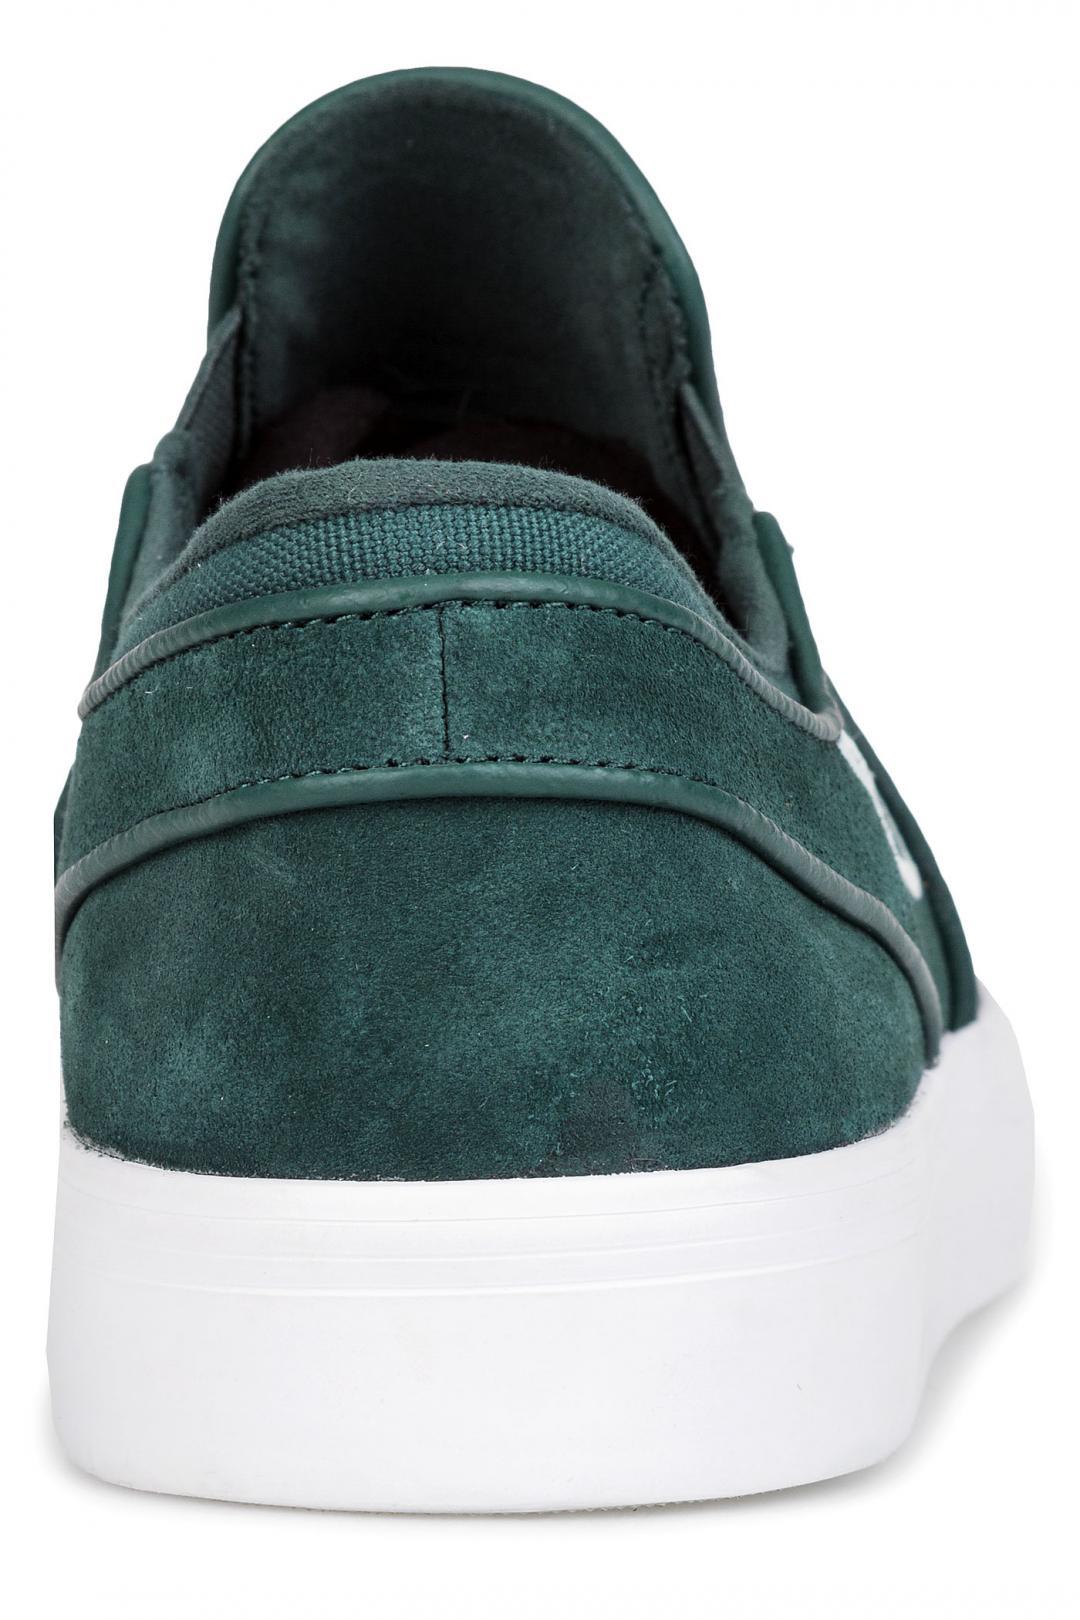 Uomo Nike SB Zoom Stefan Janoski Slip deep jungle barely grey   Sneakers slip on